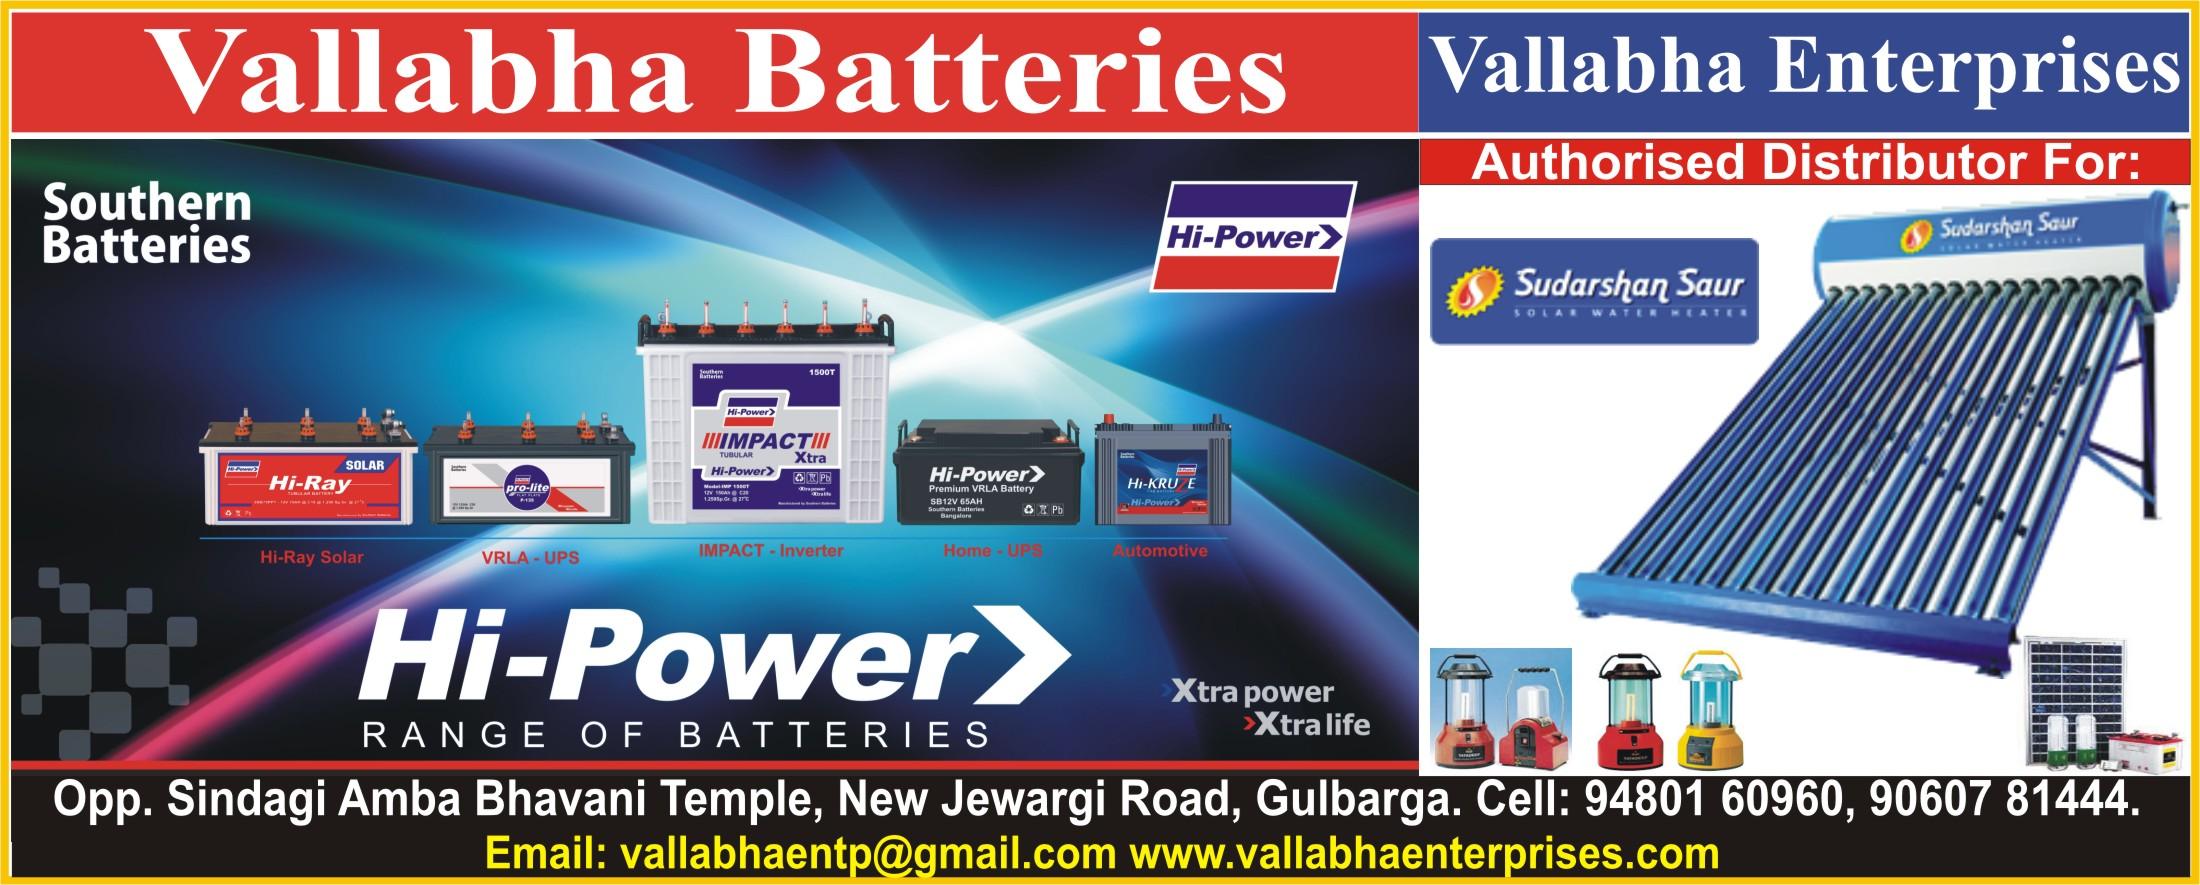 Vallabha Batteries